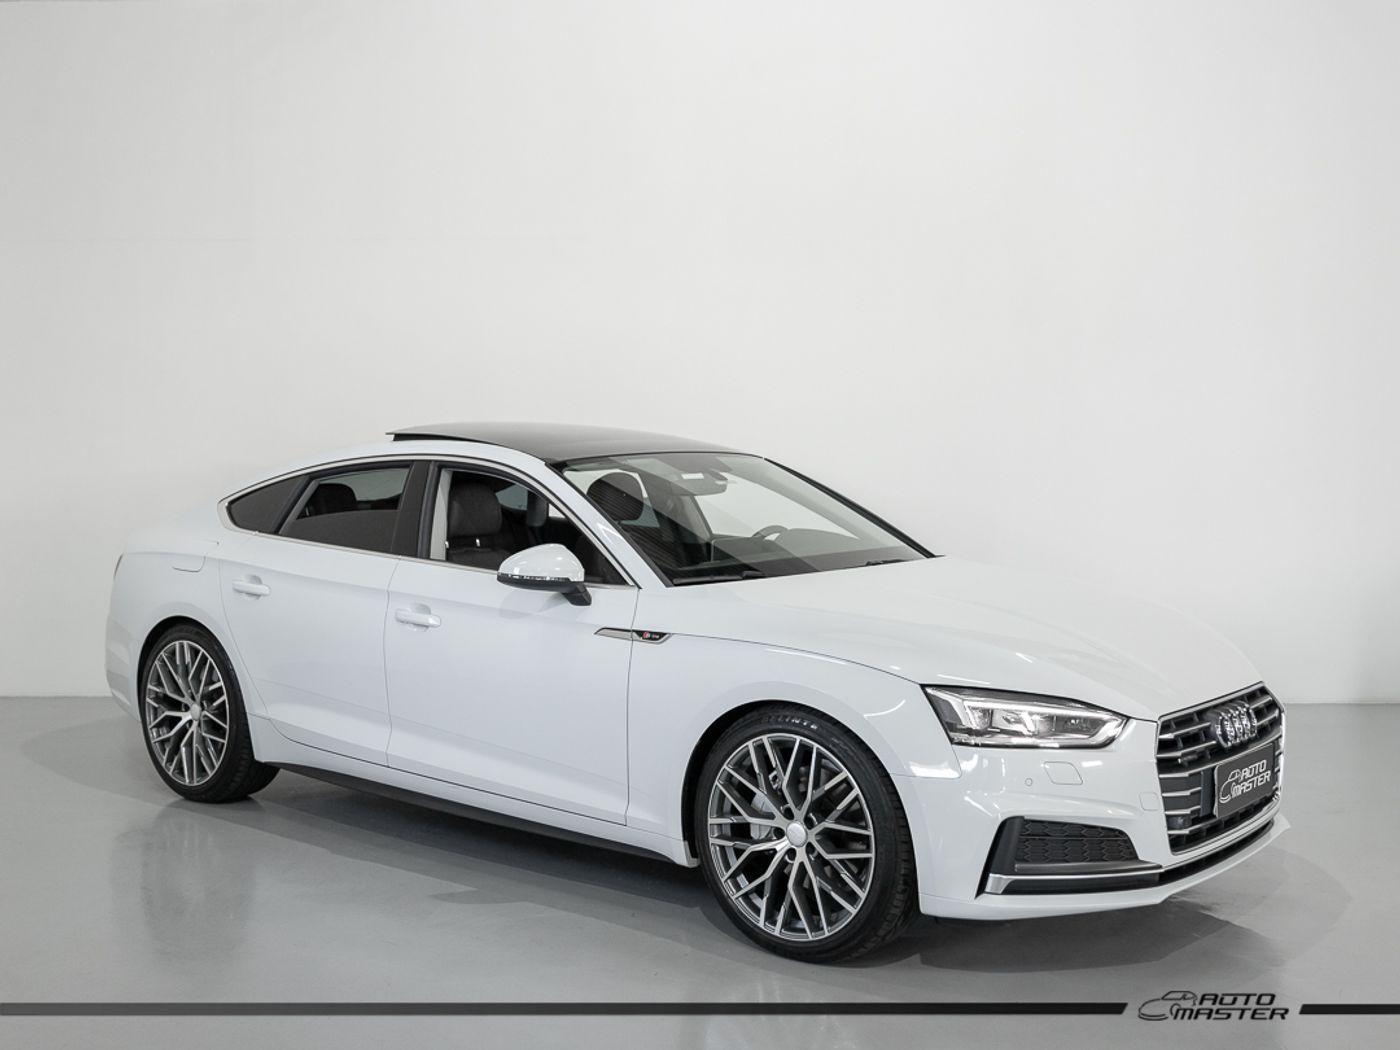 Audi A5 Ambit. Plus Sport. 2.0 TFSI S tronic